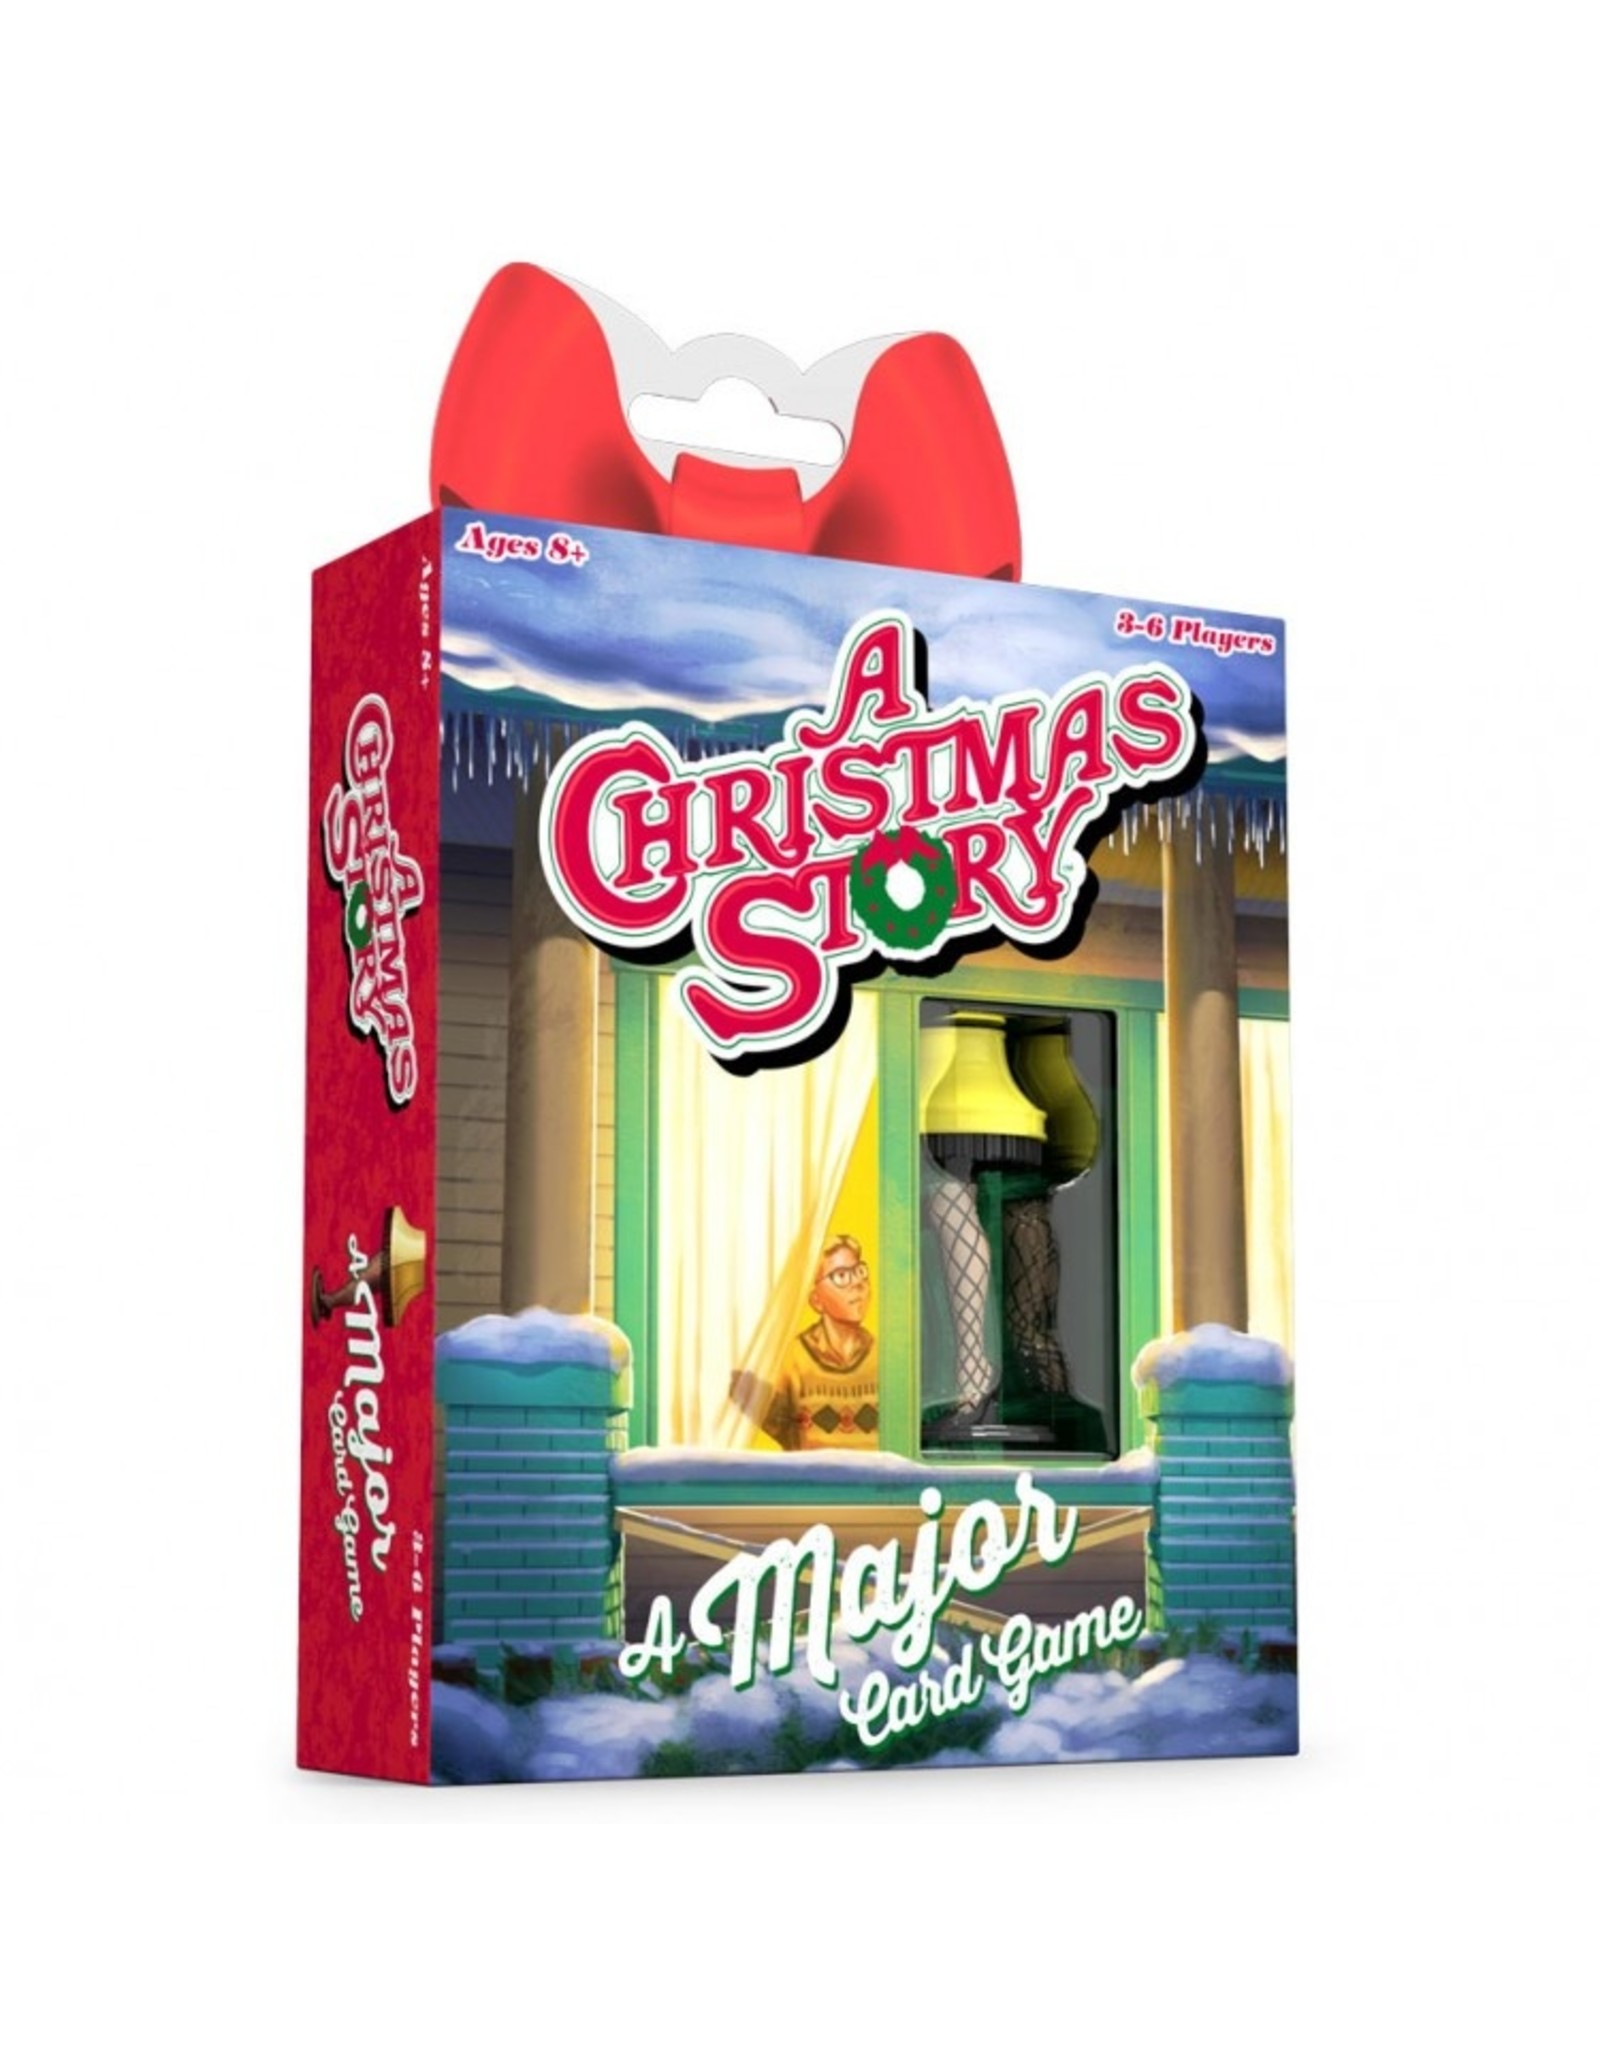 Funko Christmas Story: A MAJOR Card Game